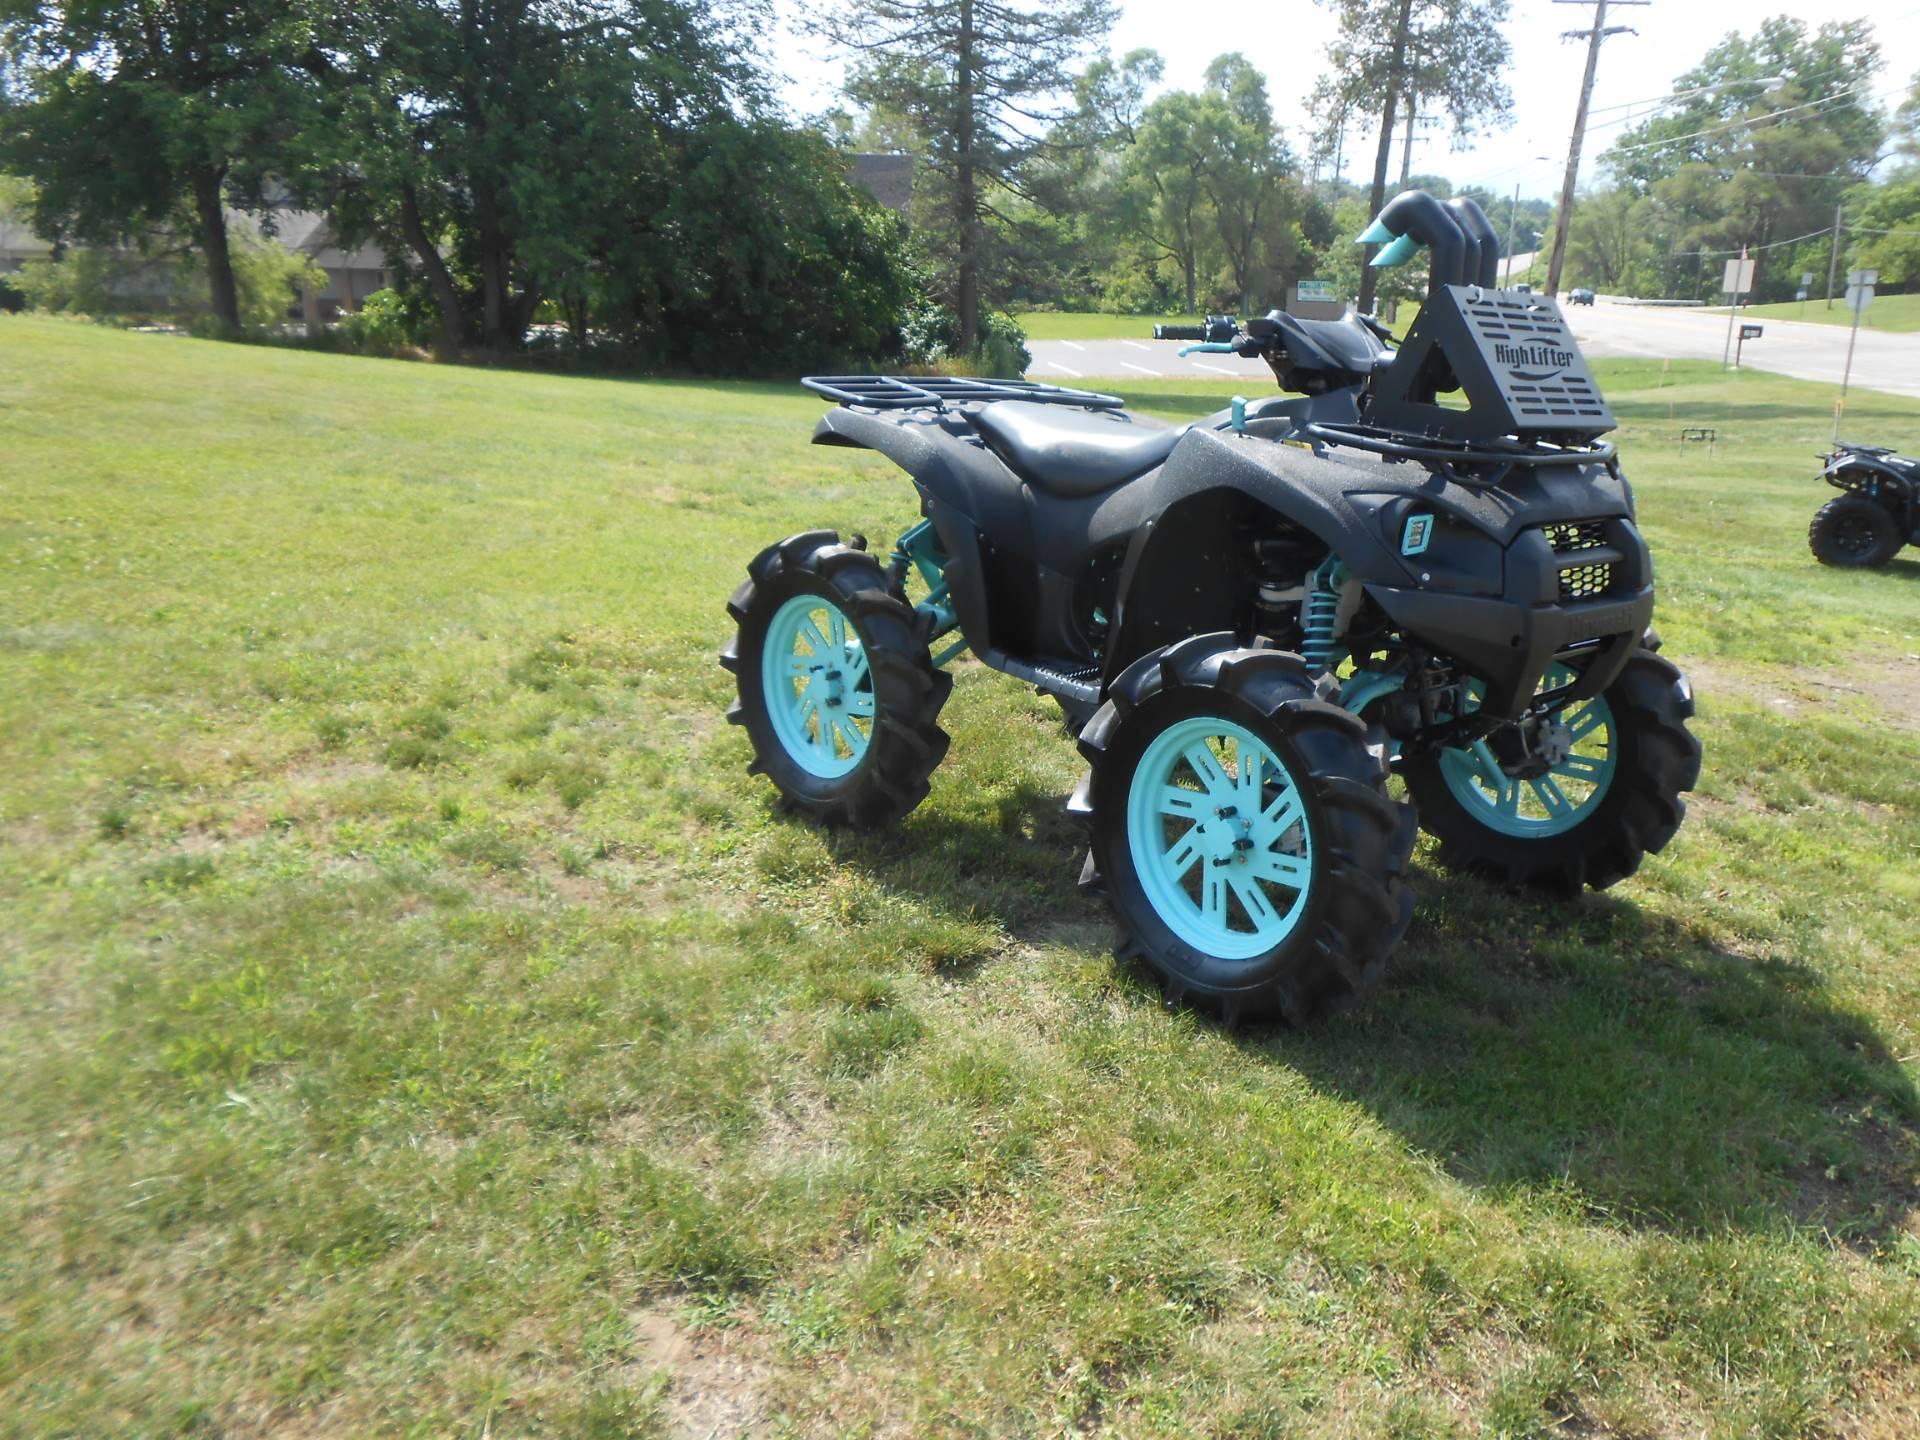 2013 Kawasaki Brute Force® 750 4x4i in Howell, Michigan